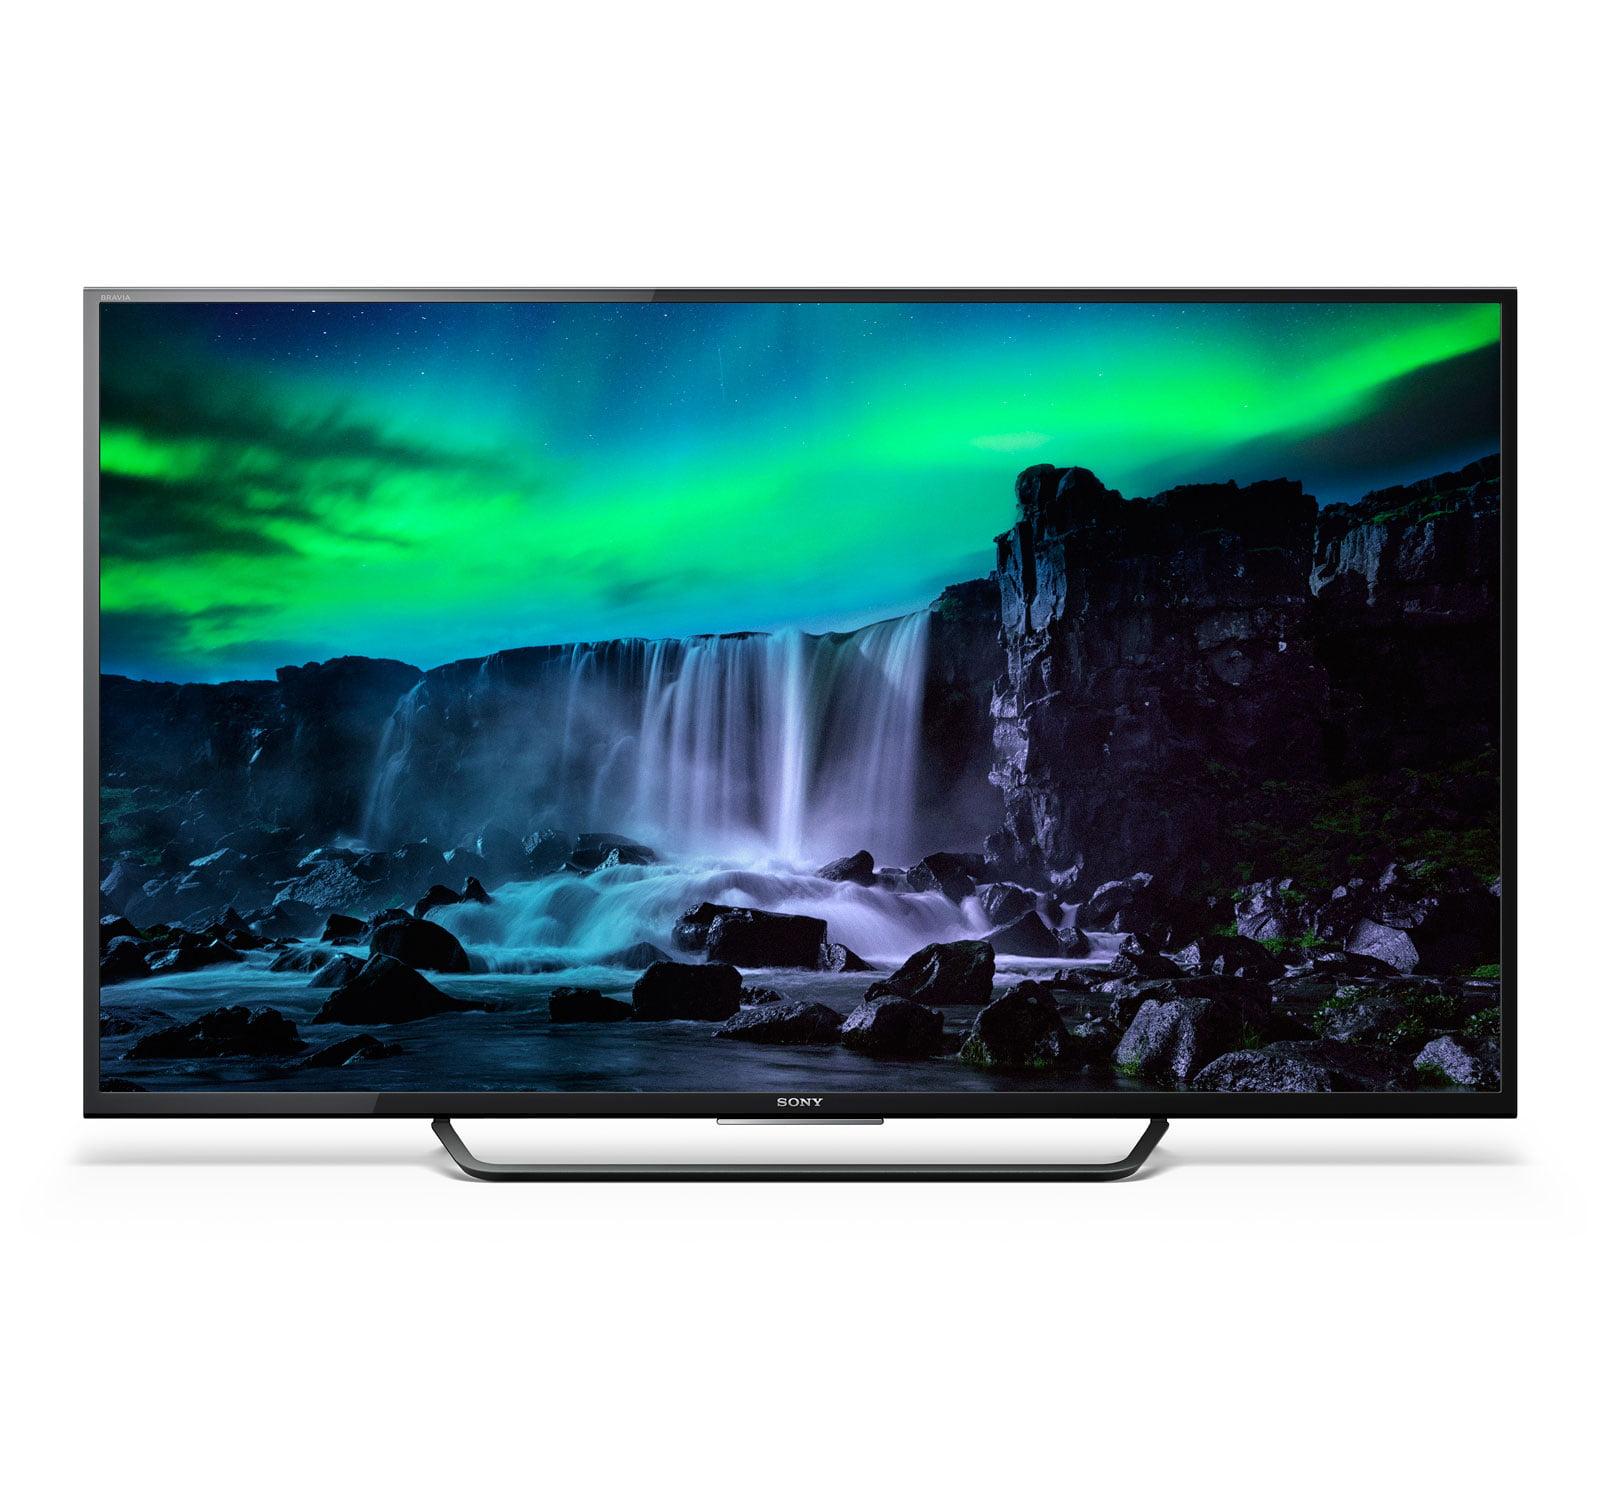 Sony XBR65X810C 65-inch 4K UHD LED Smart TV